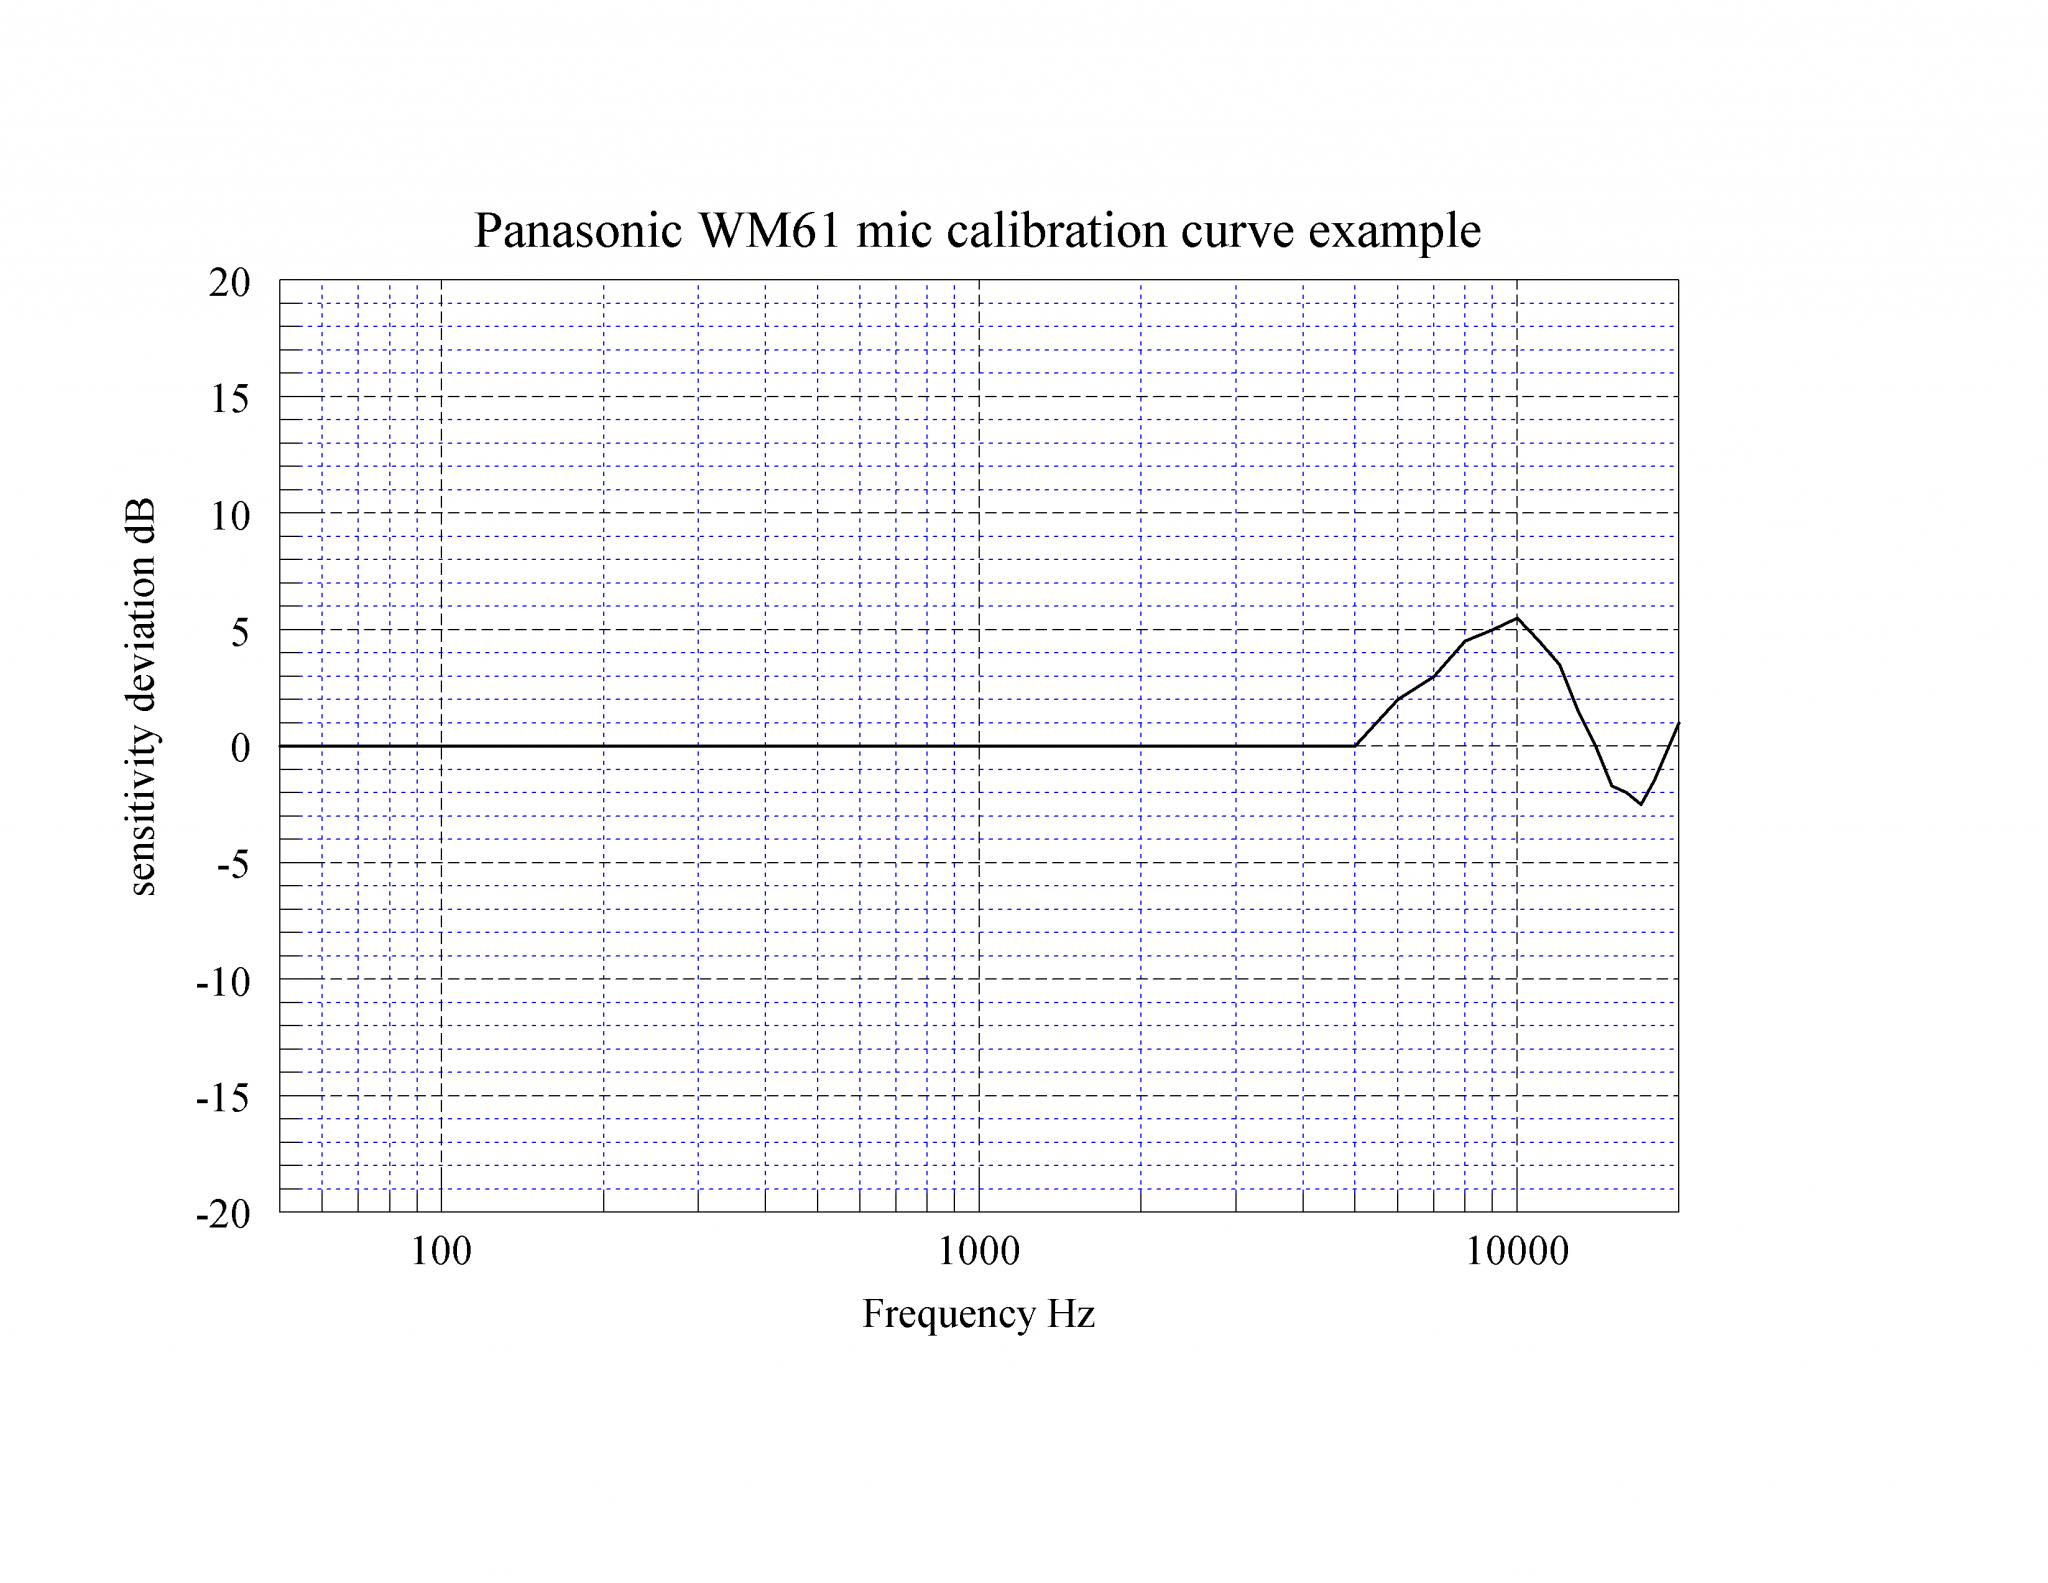 panasonic wm61 mic calibration example.png